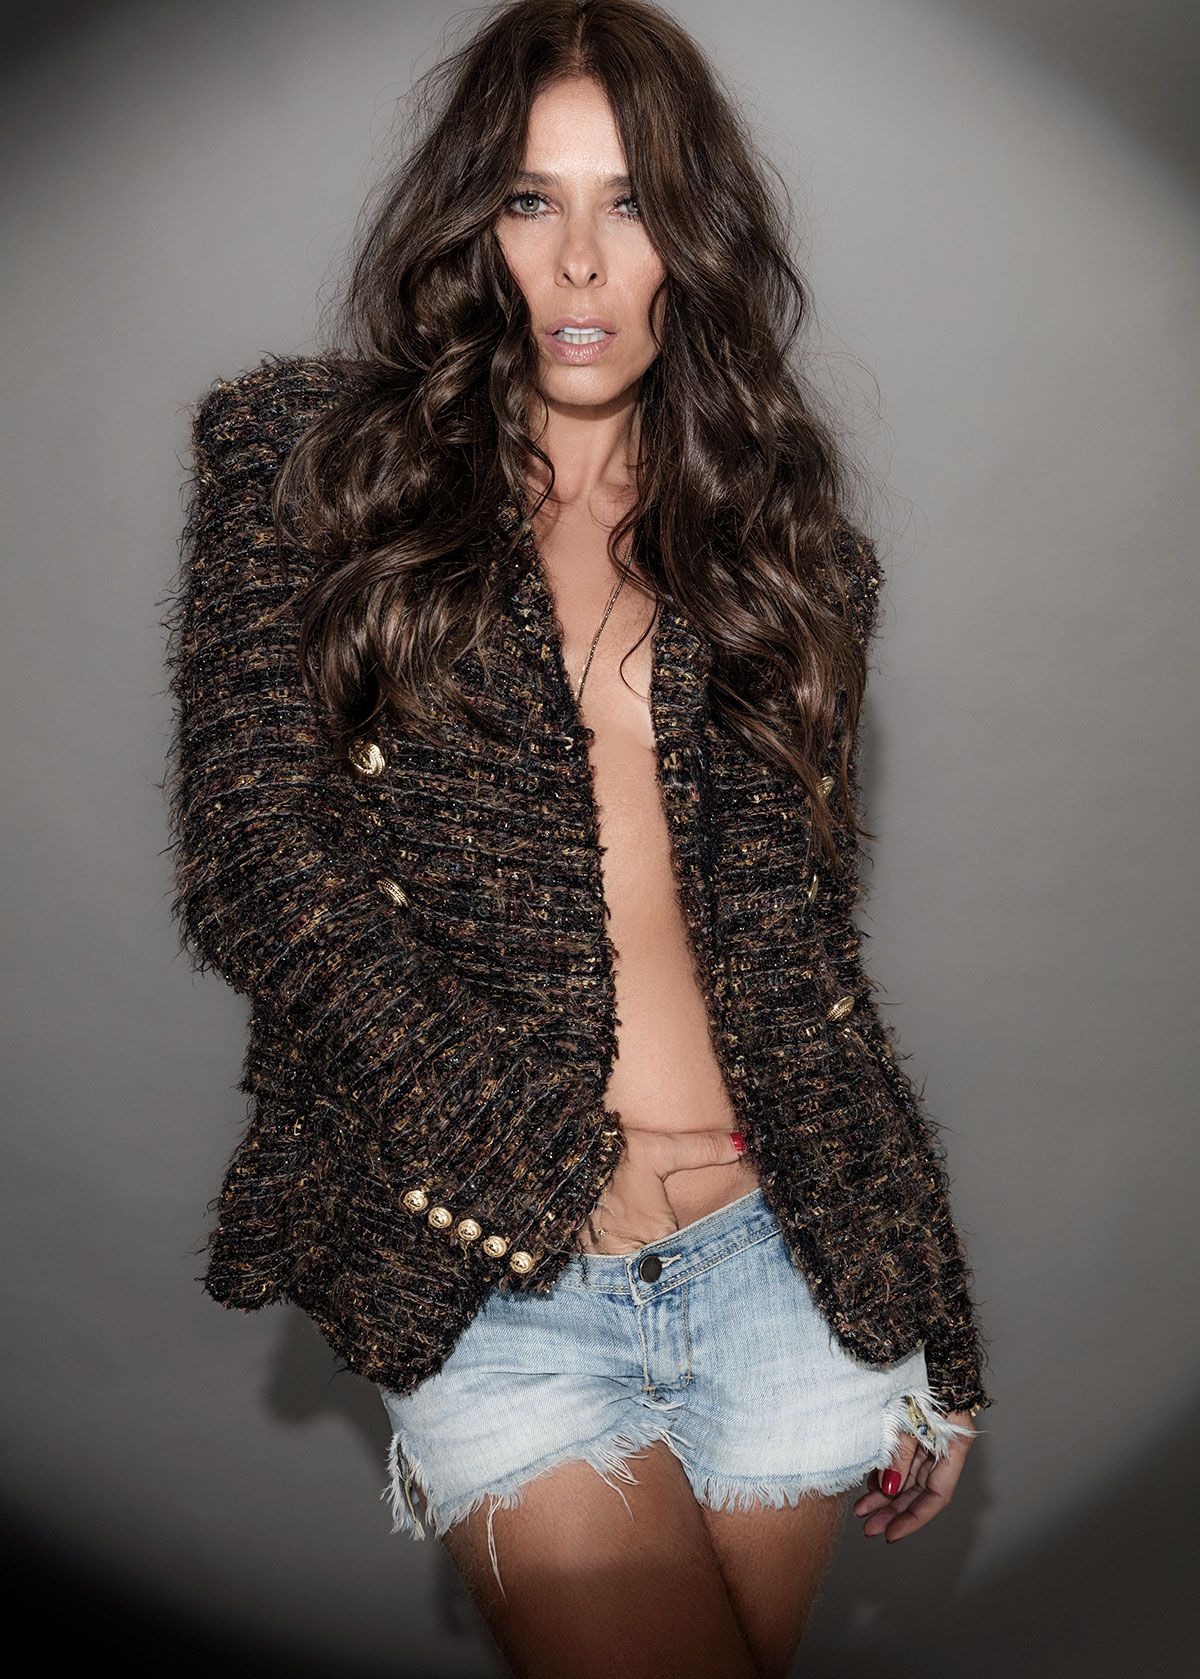 Adriane Galisteu Nude Photos 50